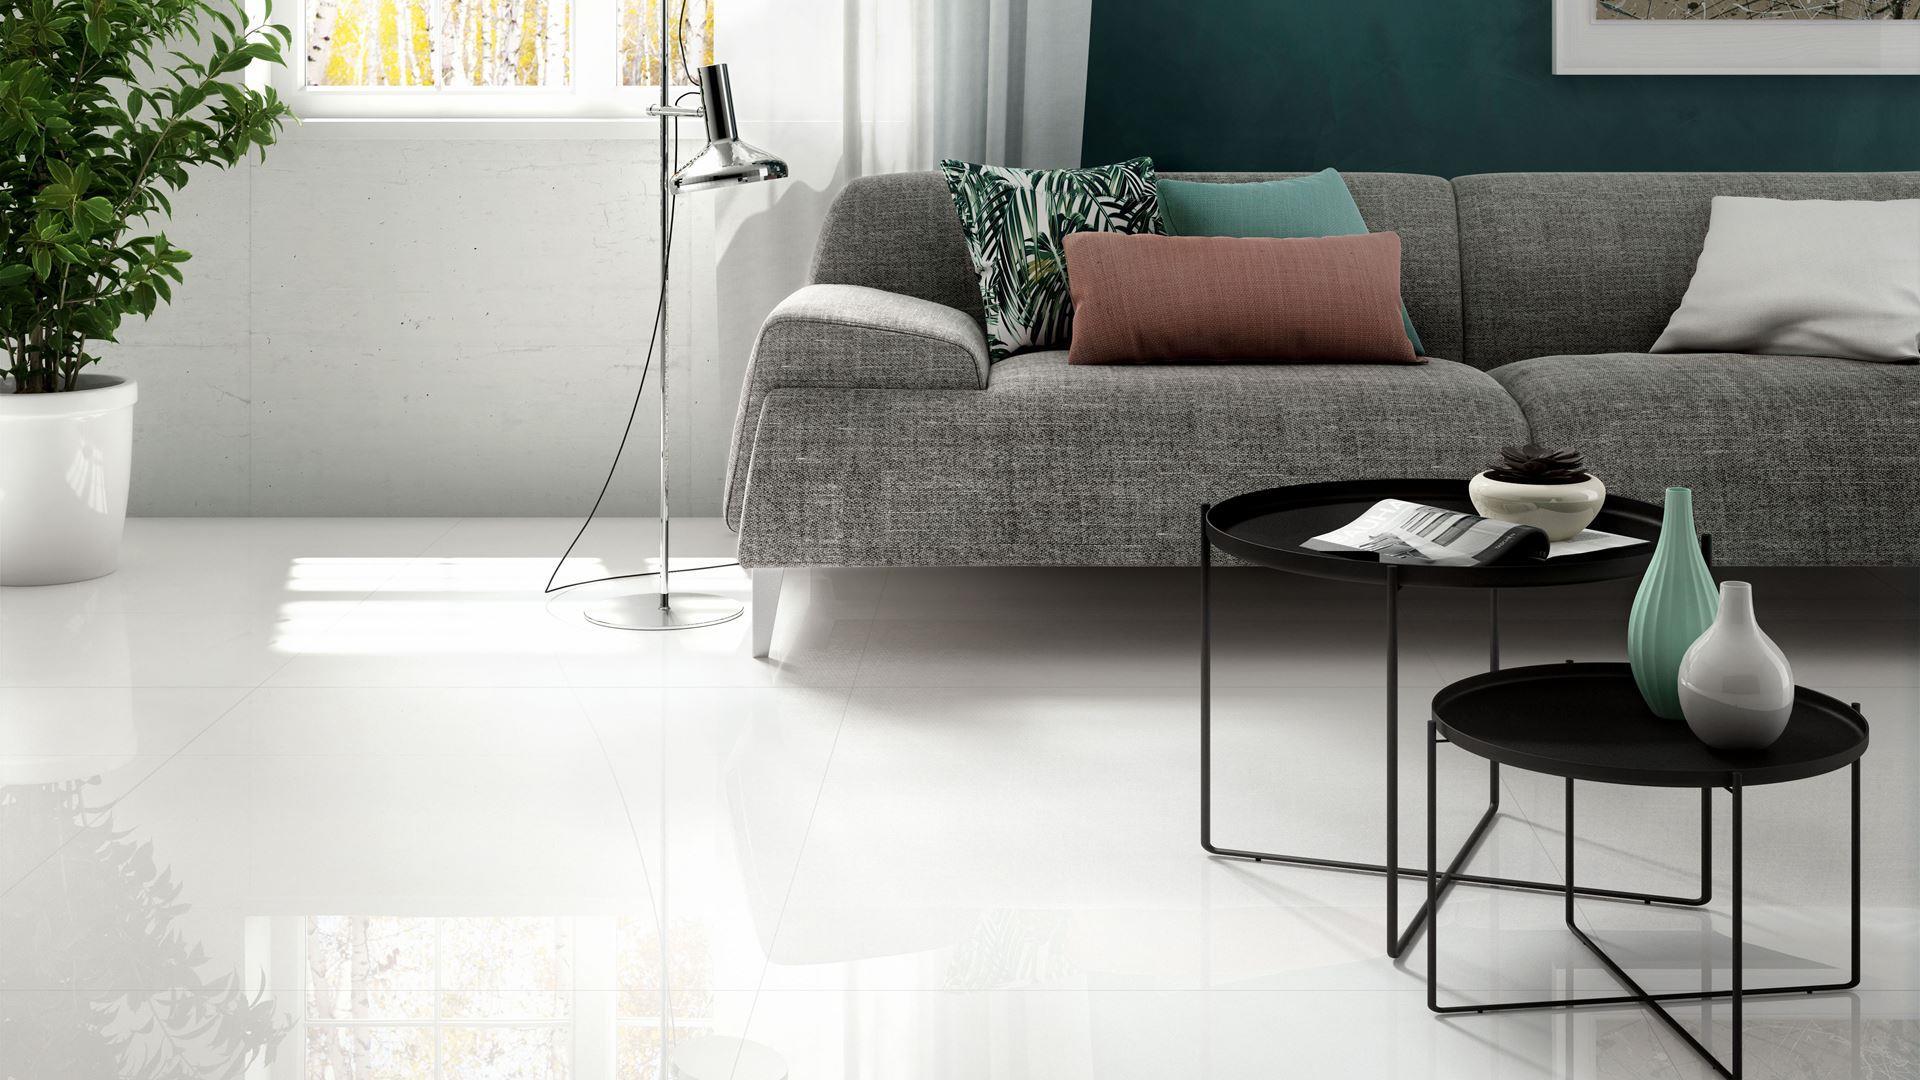 Amazing Black White Tegels En Vloeren In Gres Porcellanato En Kerlite Evergreenethics Interior Chair Design Evergreenethicsorg